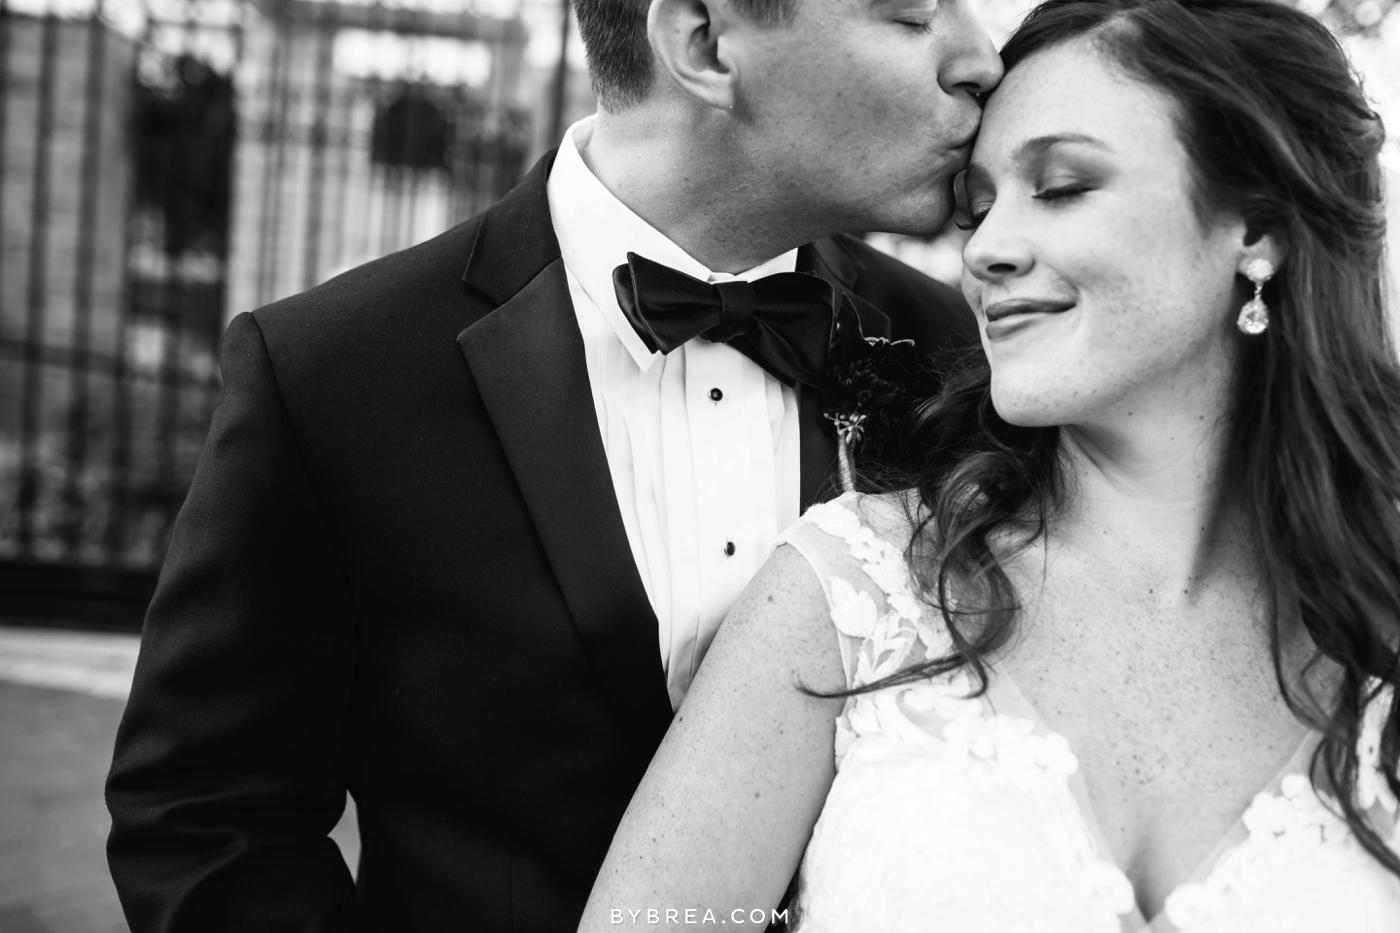 Baltimore wedding photo groom kissing bride's forehead